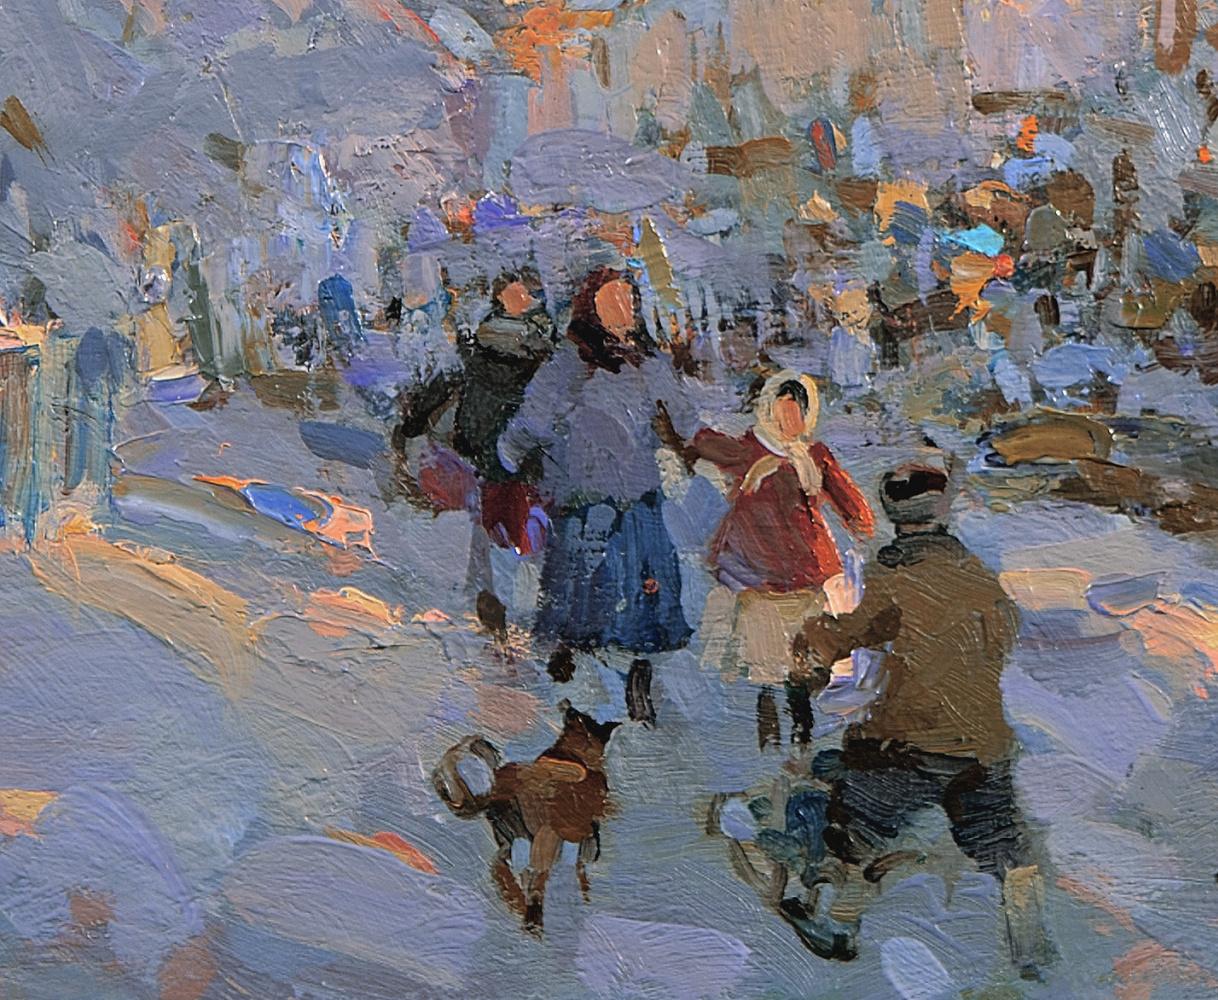 Winter evening in Rybinsk. Oil on canvas 29.5 x 37.5 cm. 2015